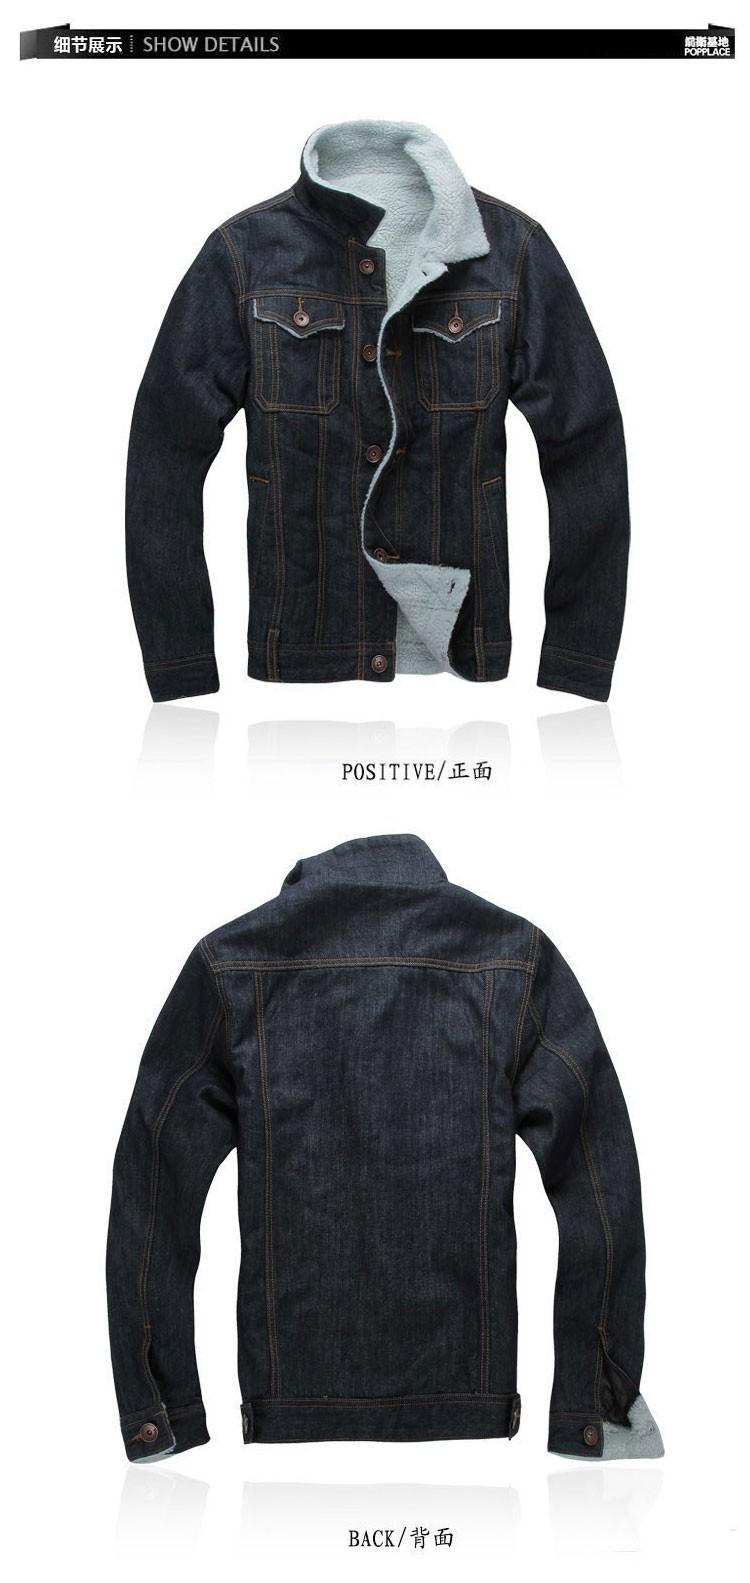 50b3250b8b9 Autumn Winter Mens Casual Clothes M-XXL Spliecd Corduroy Turn-down Collar  Striped Liner Blue Cotton Male Denim Jacket JeansUSD 39.00 piece. 1 011  1 02 1 03 ...